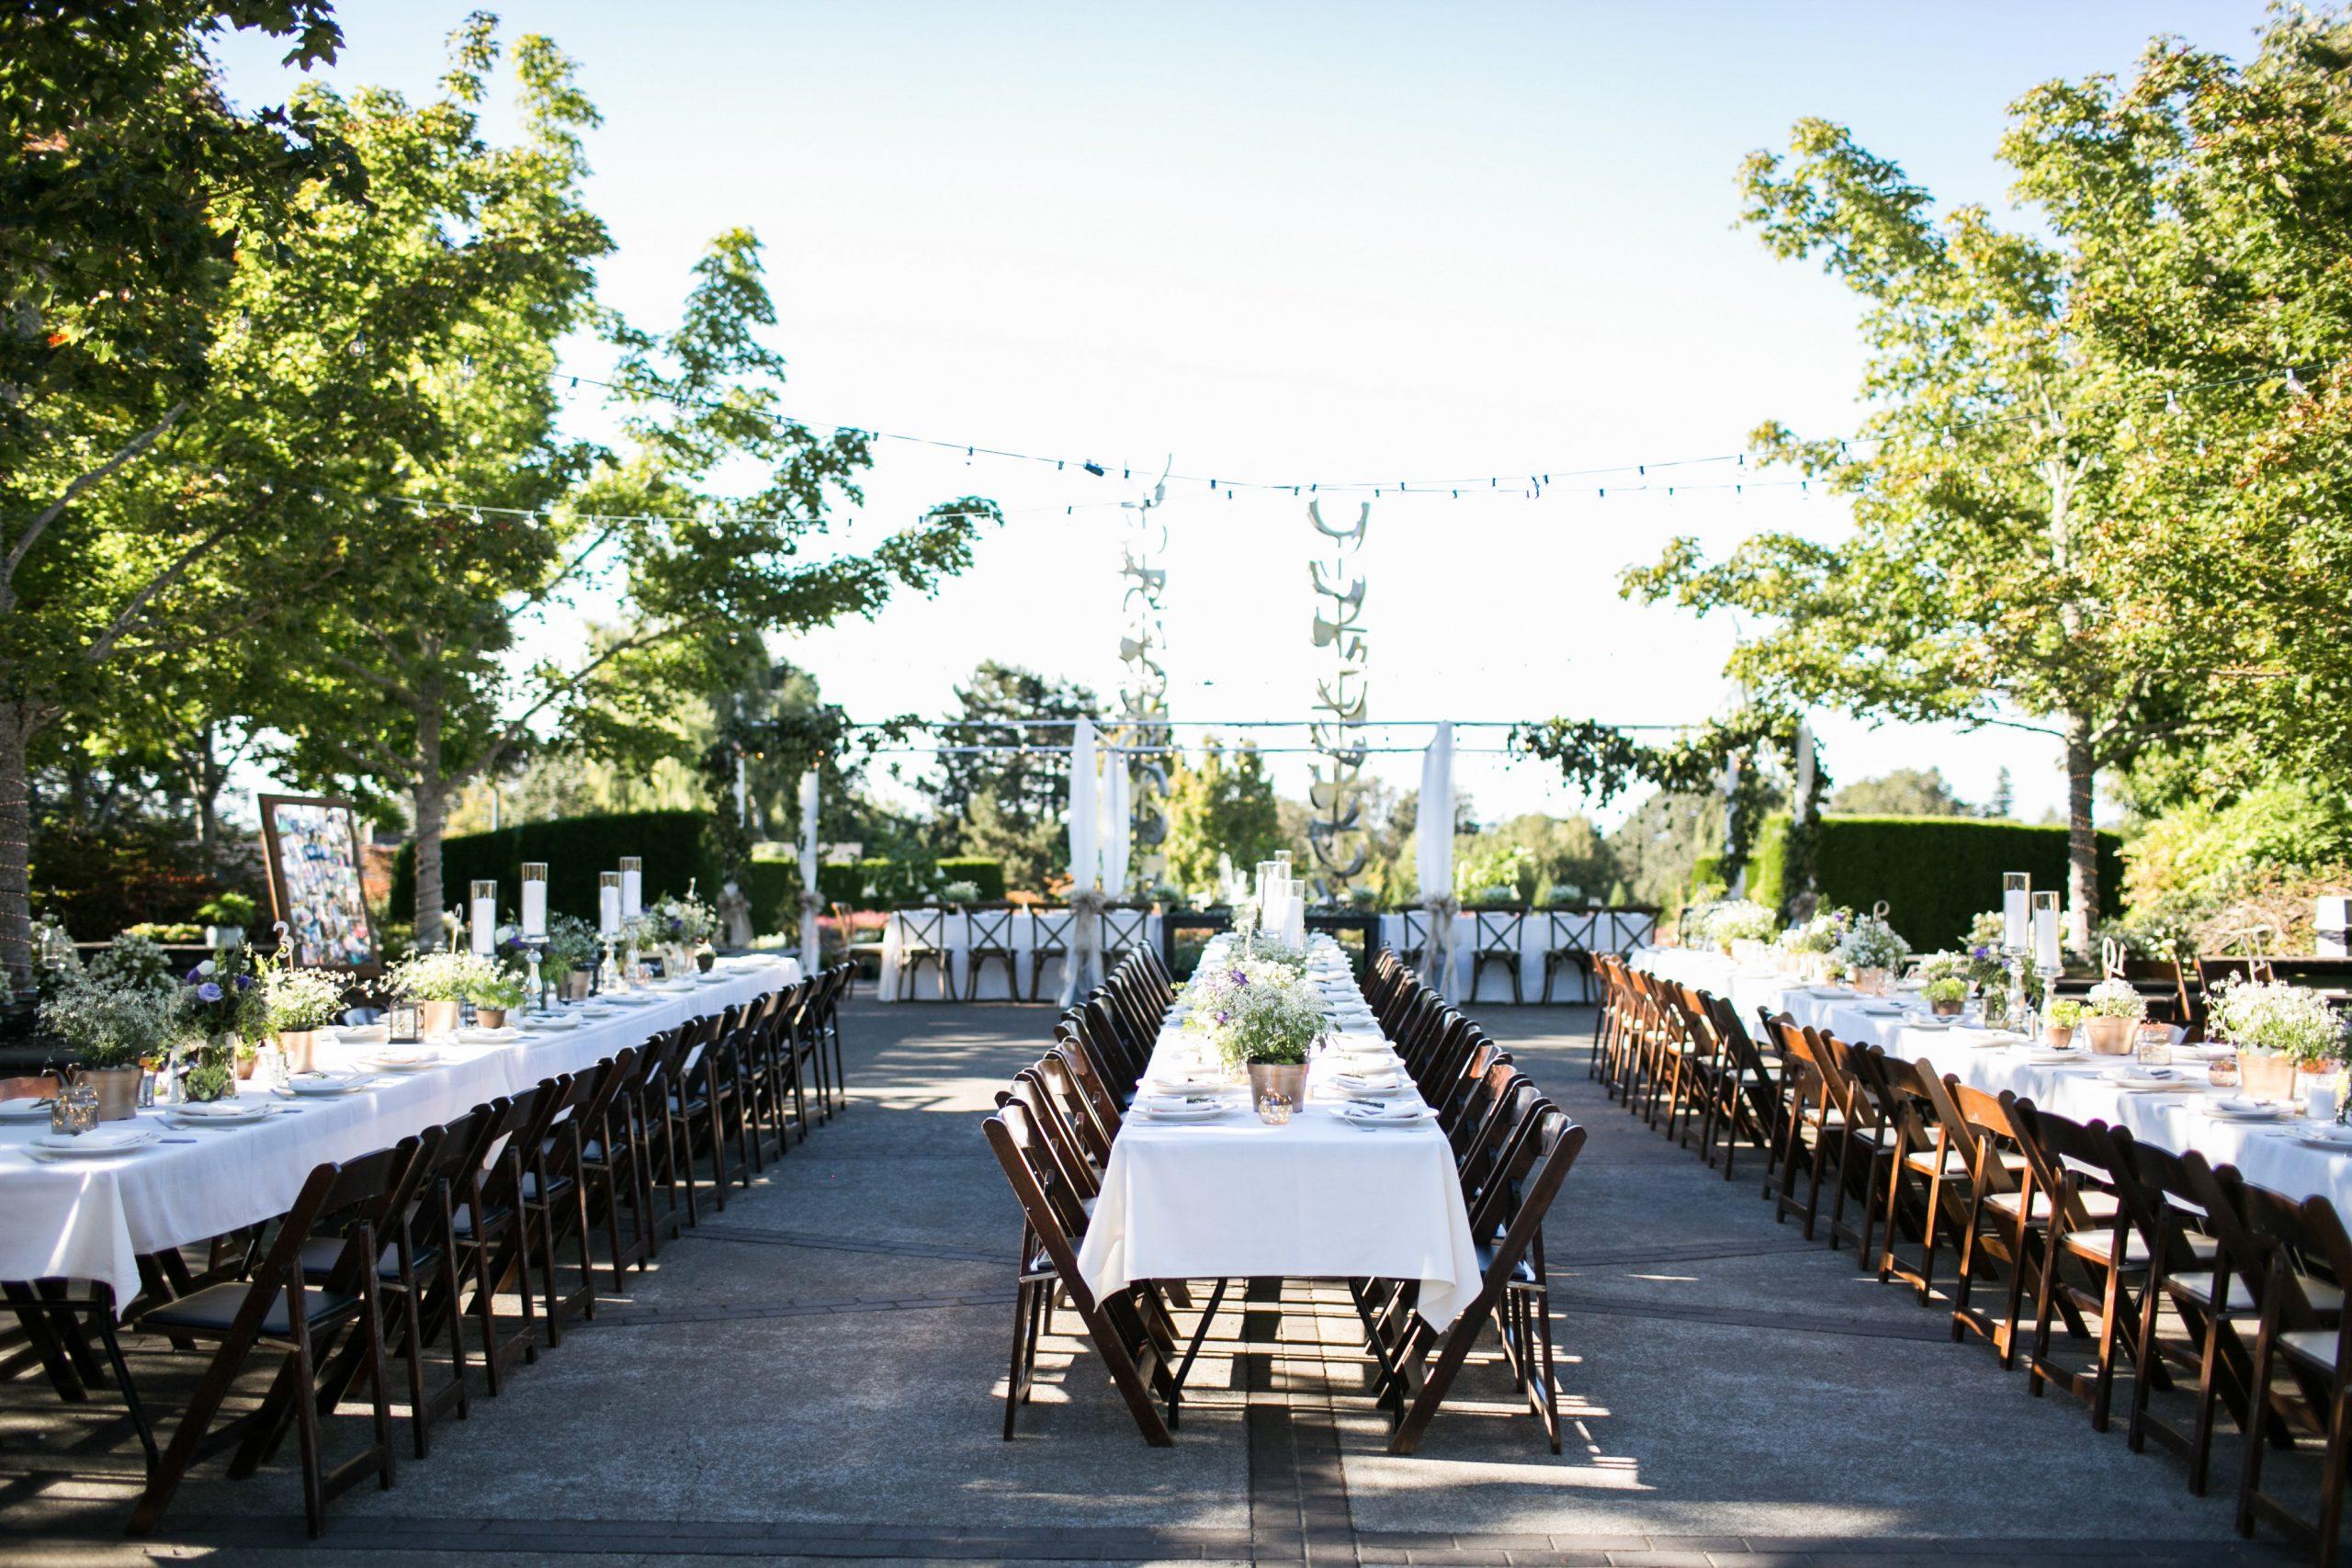 Oregon Wedding Venue - The Oregon Garden